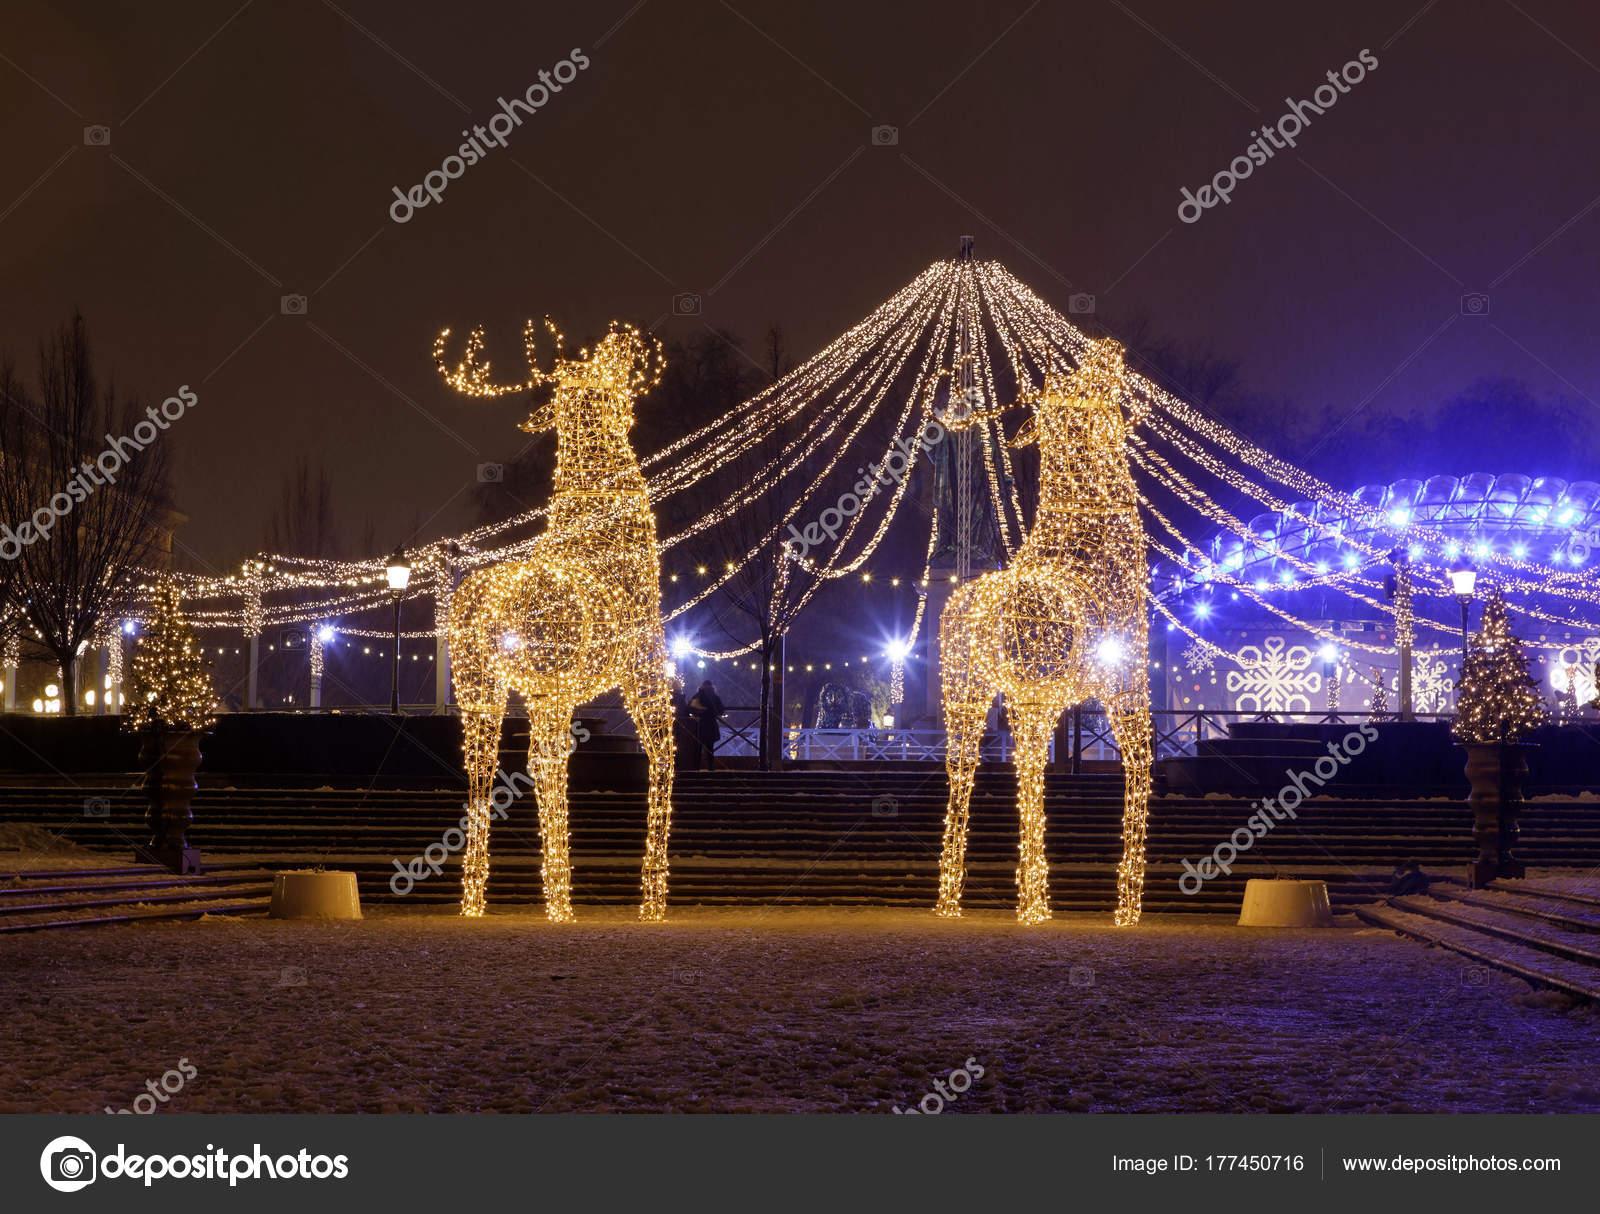 Decoraci n de navidad renos gigantes de luz led foto de for Adornos navidenos 2017 trackid sp 006